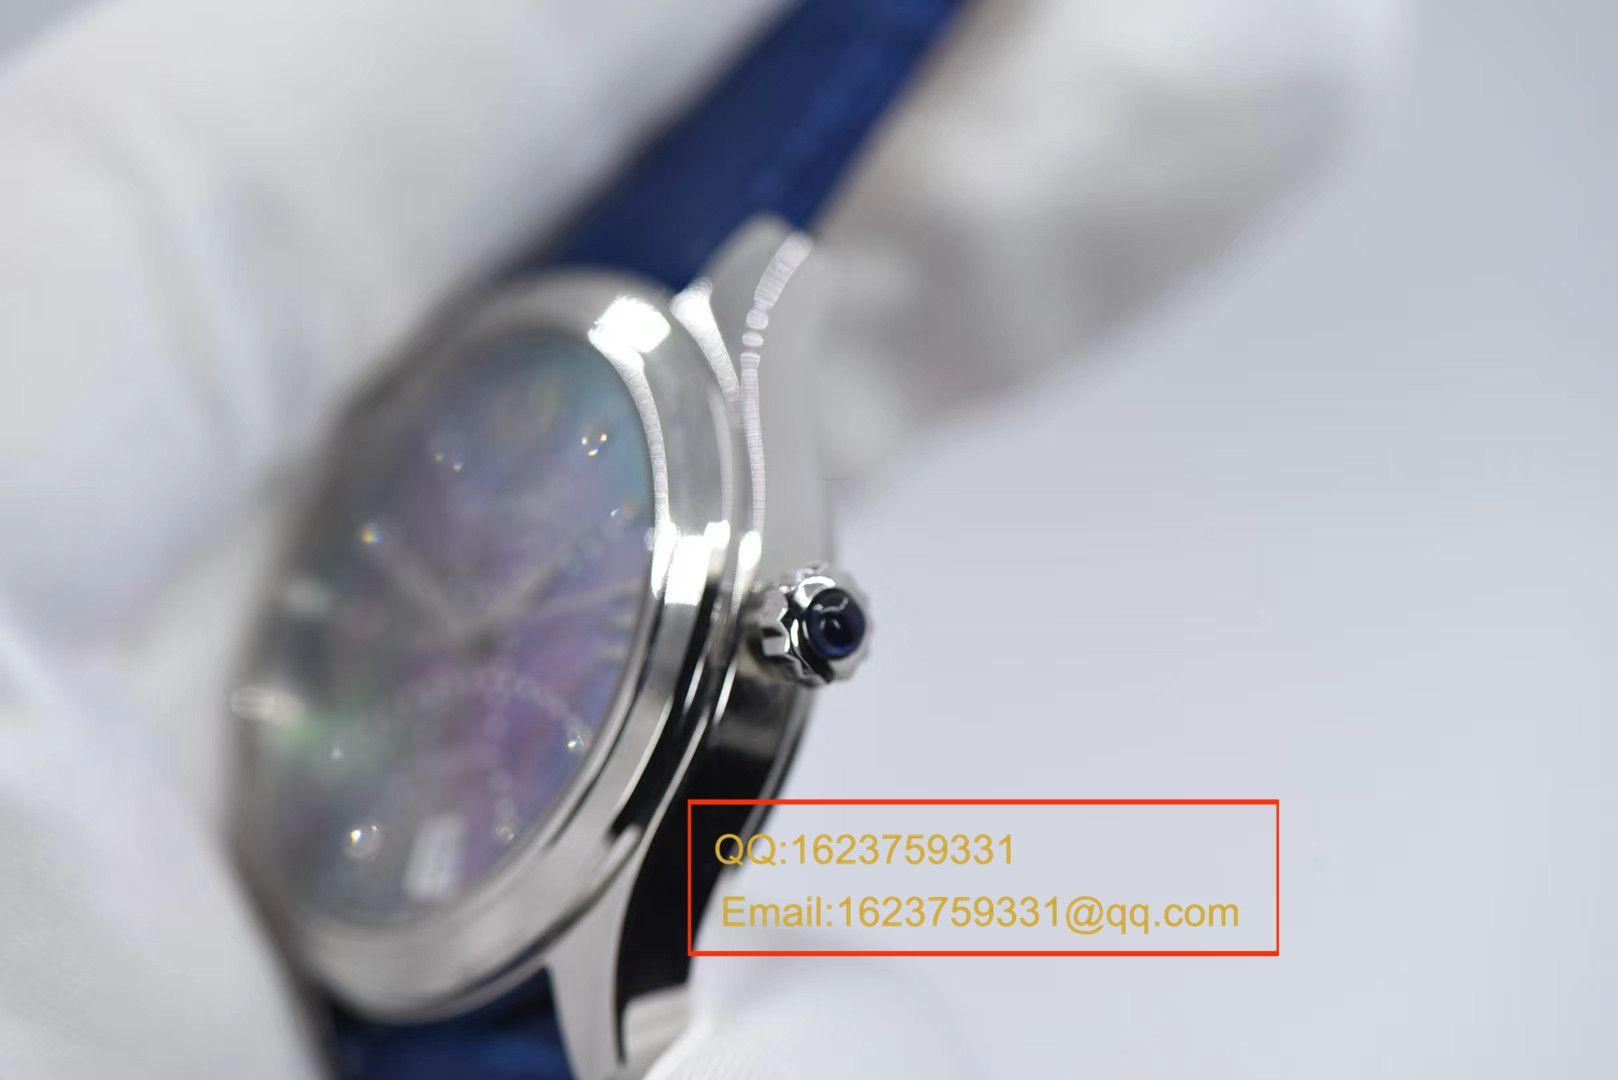 【FK厂顶级复刻手表】格拉苏蒂原创女表系列 1-39-22-11-02-04腕表 / GLA050